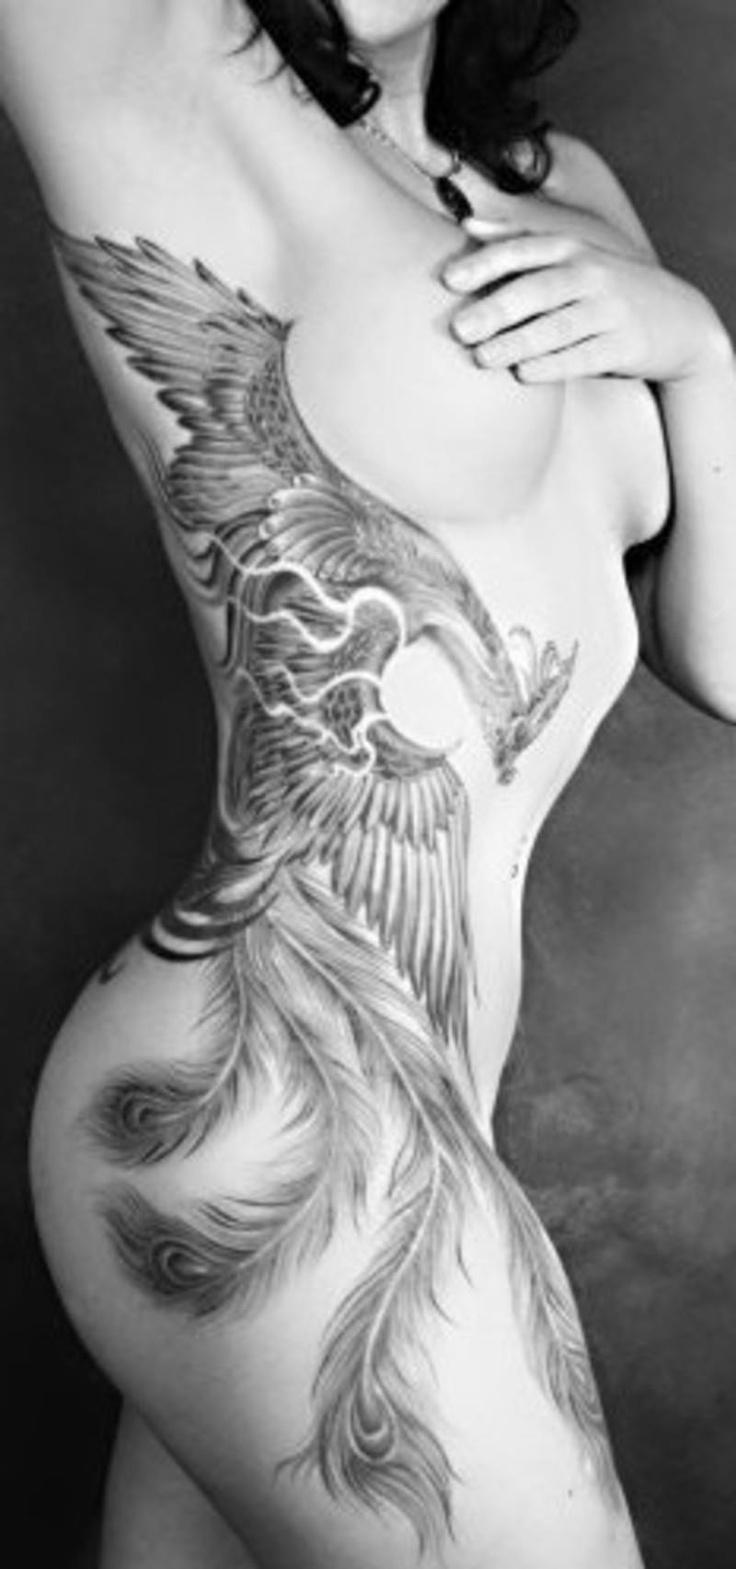 best Tatuagens images on Pinterest Tattoo ideas Inspiration